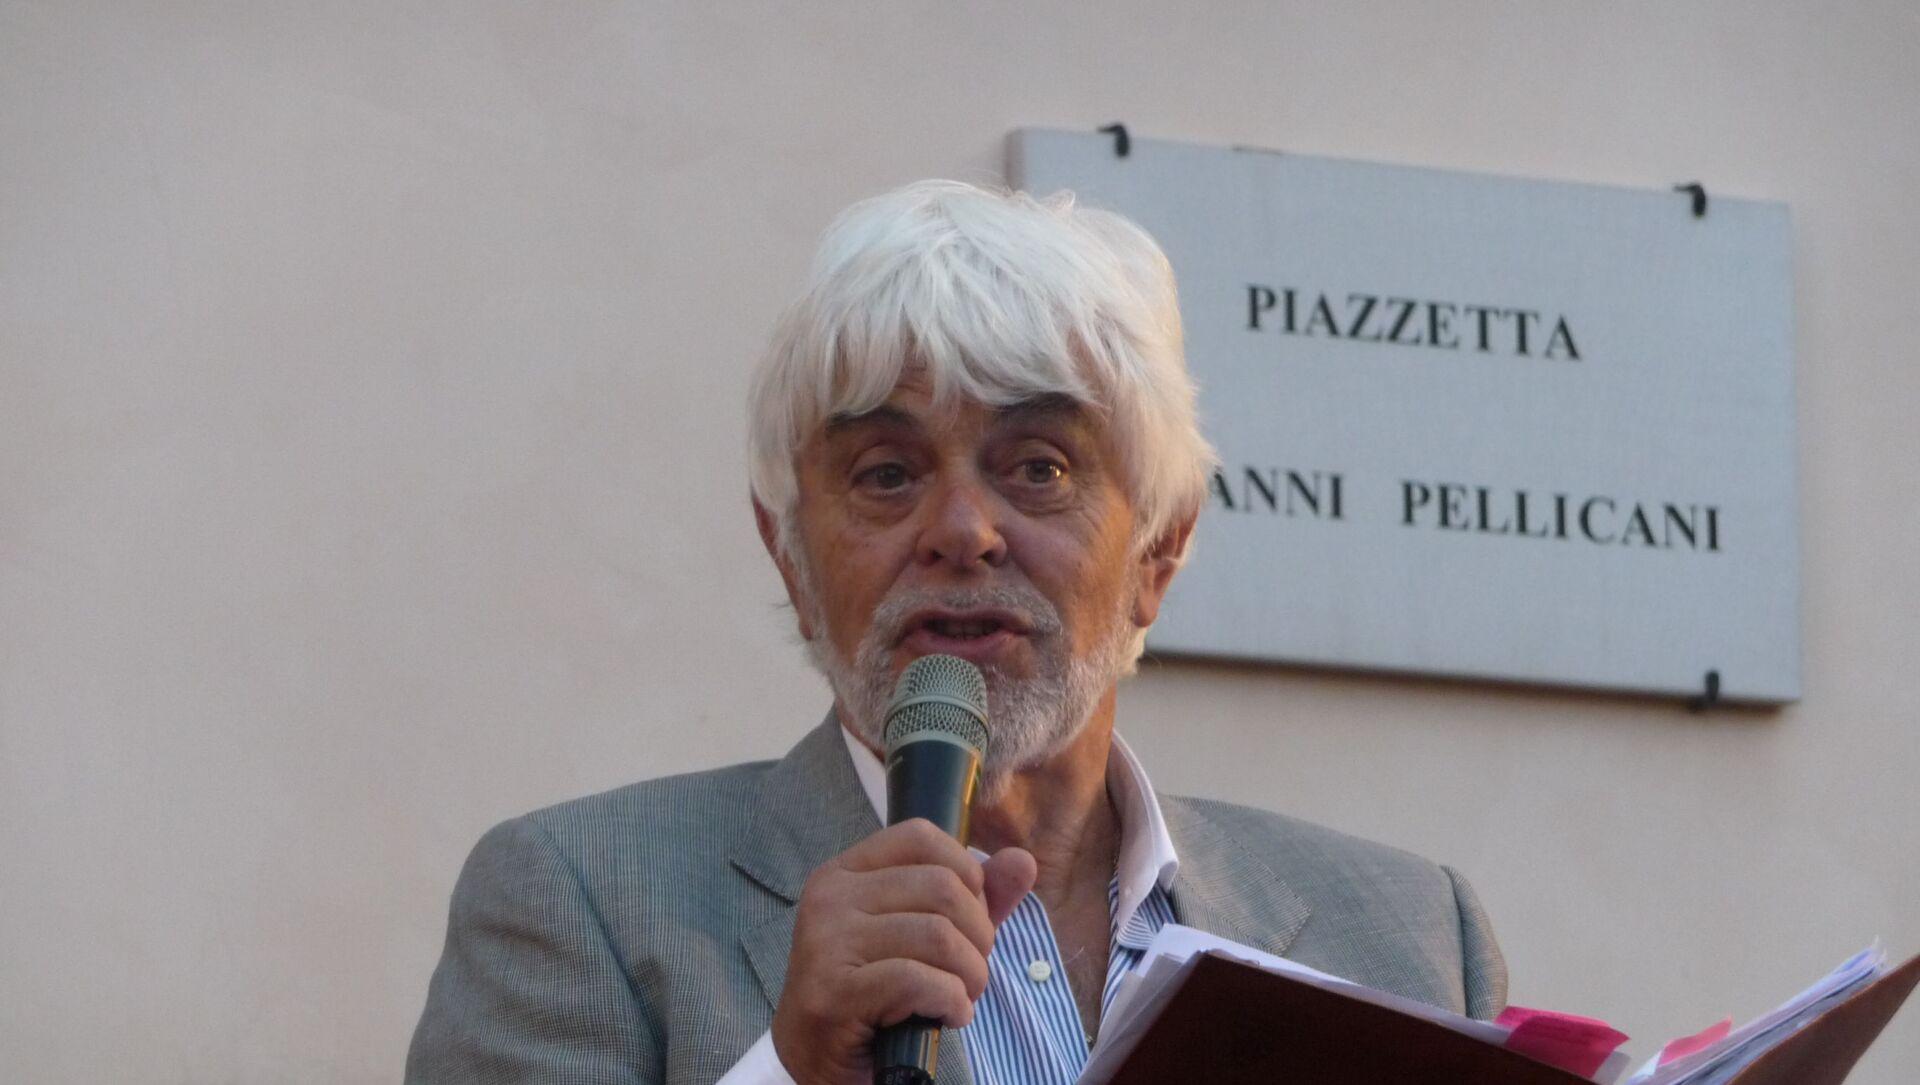 Valerio Massimo Manfredi, storico italiano - Sputnik Italia, 1920, 11.02.2021